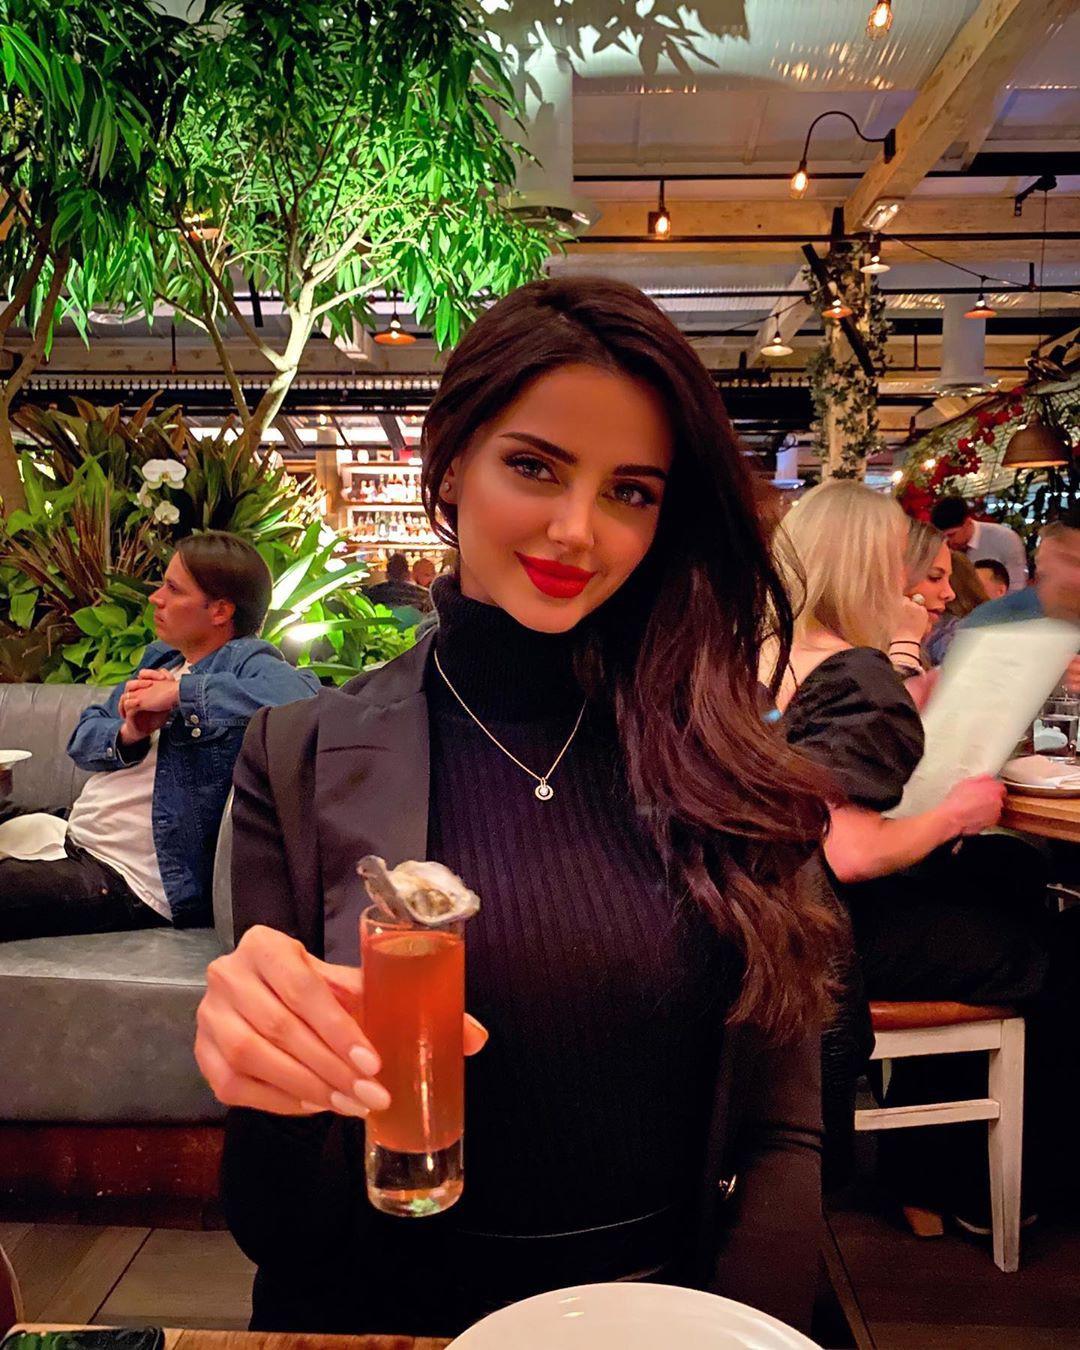 Mahlagha Jaberi Long Hair Women, distilled beverage, brown hair